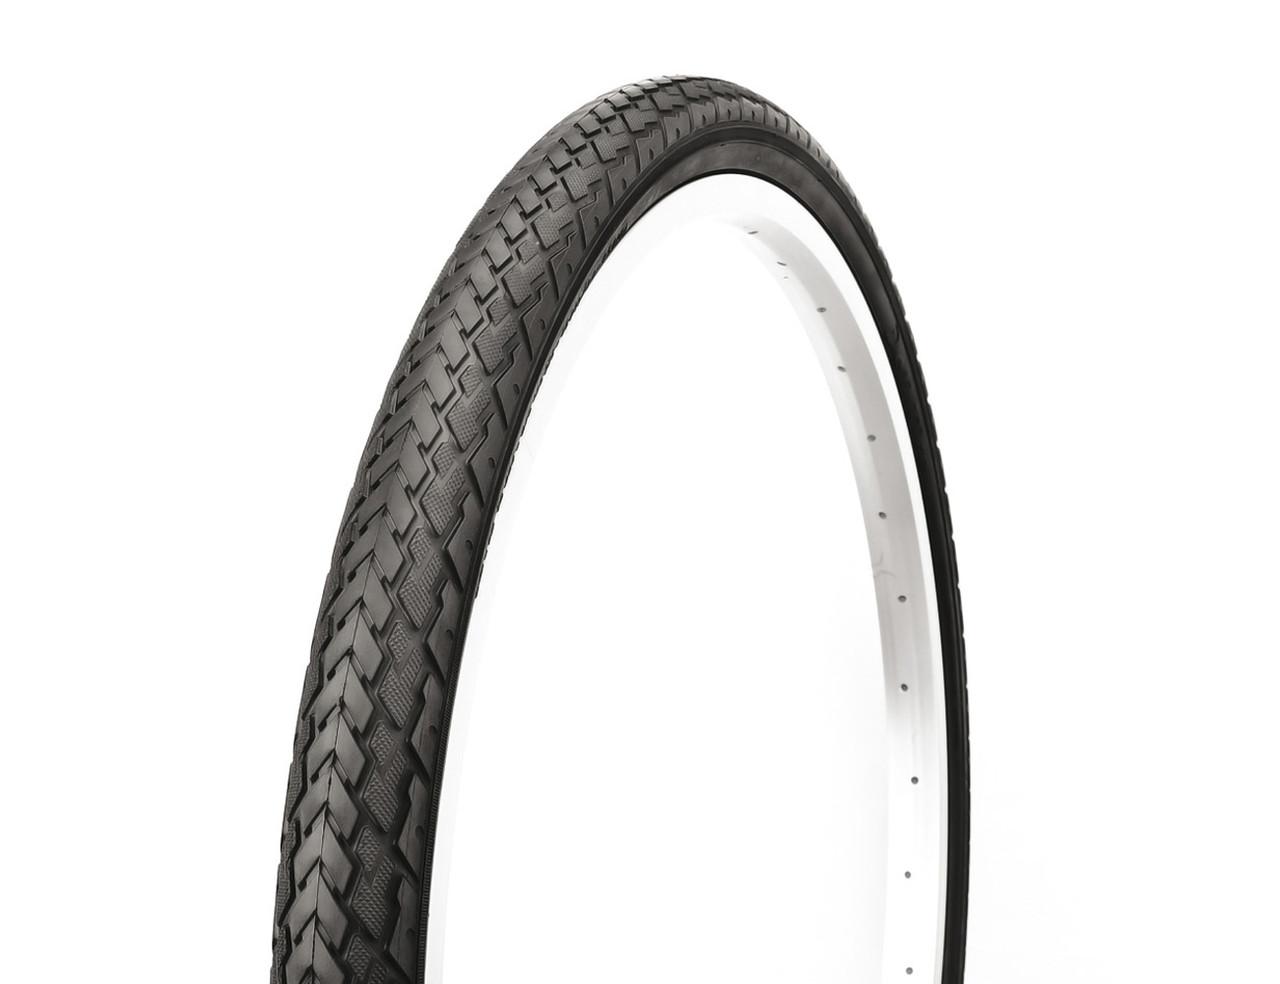 Велопокрышка 26x1.75 44-559 SA-225 Deli Tire